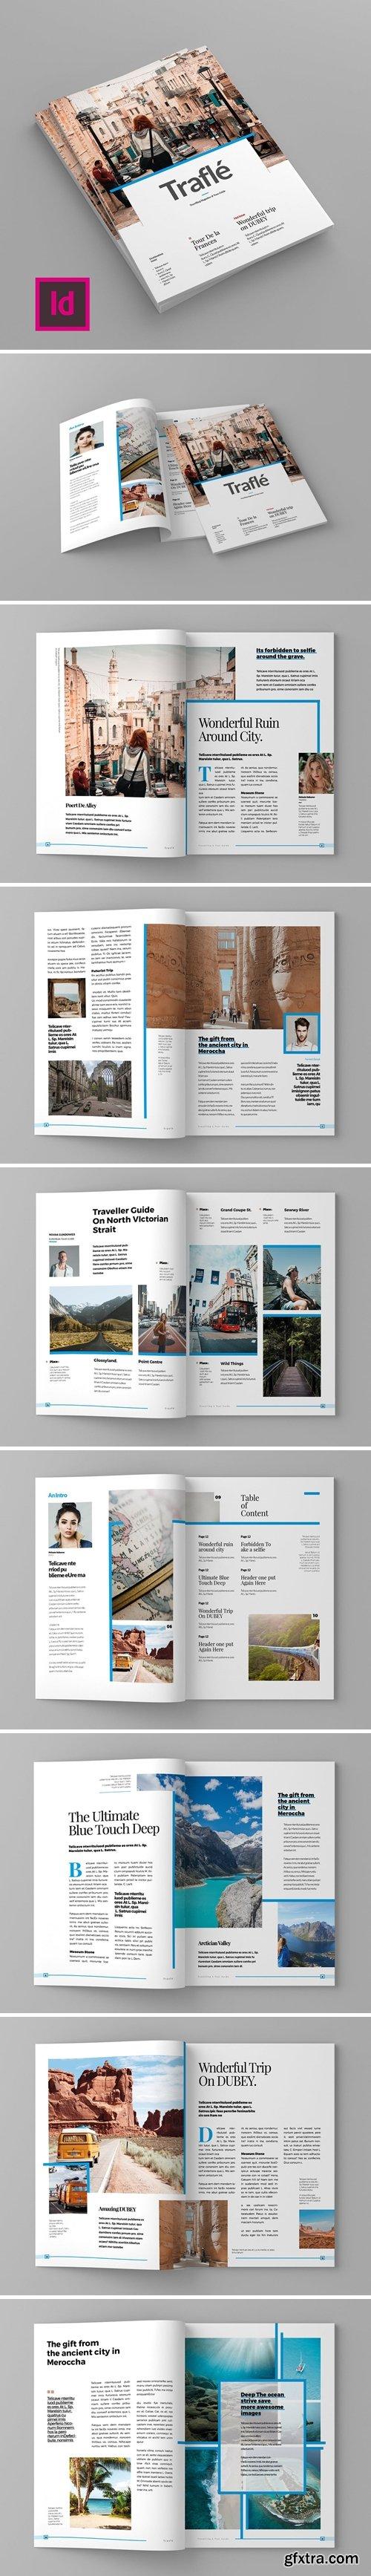 Trafle - Magazine Template